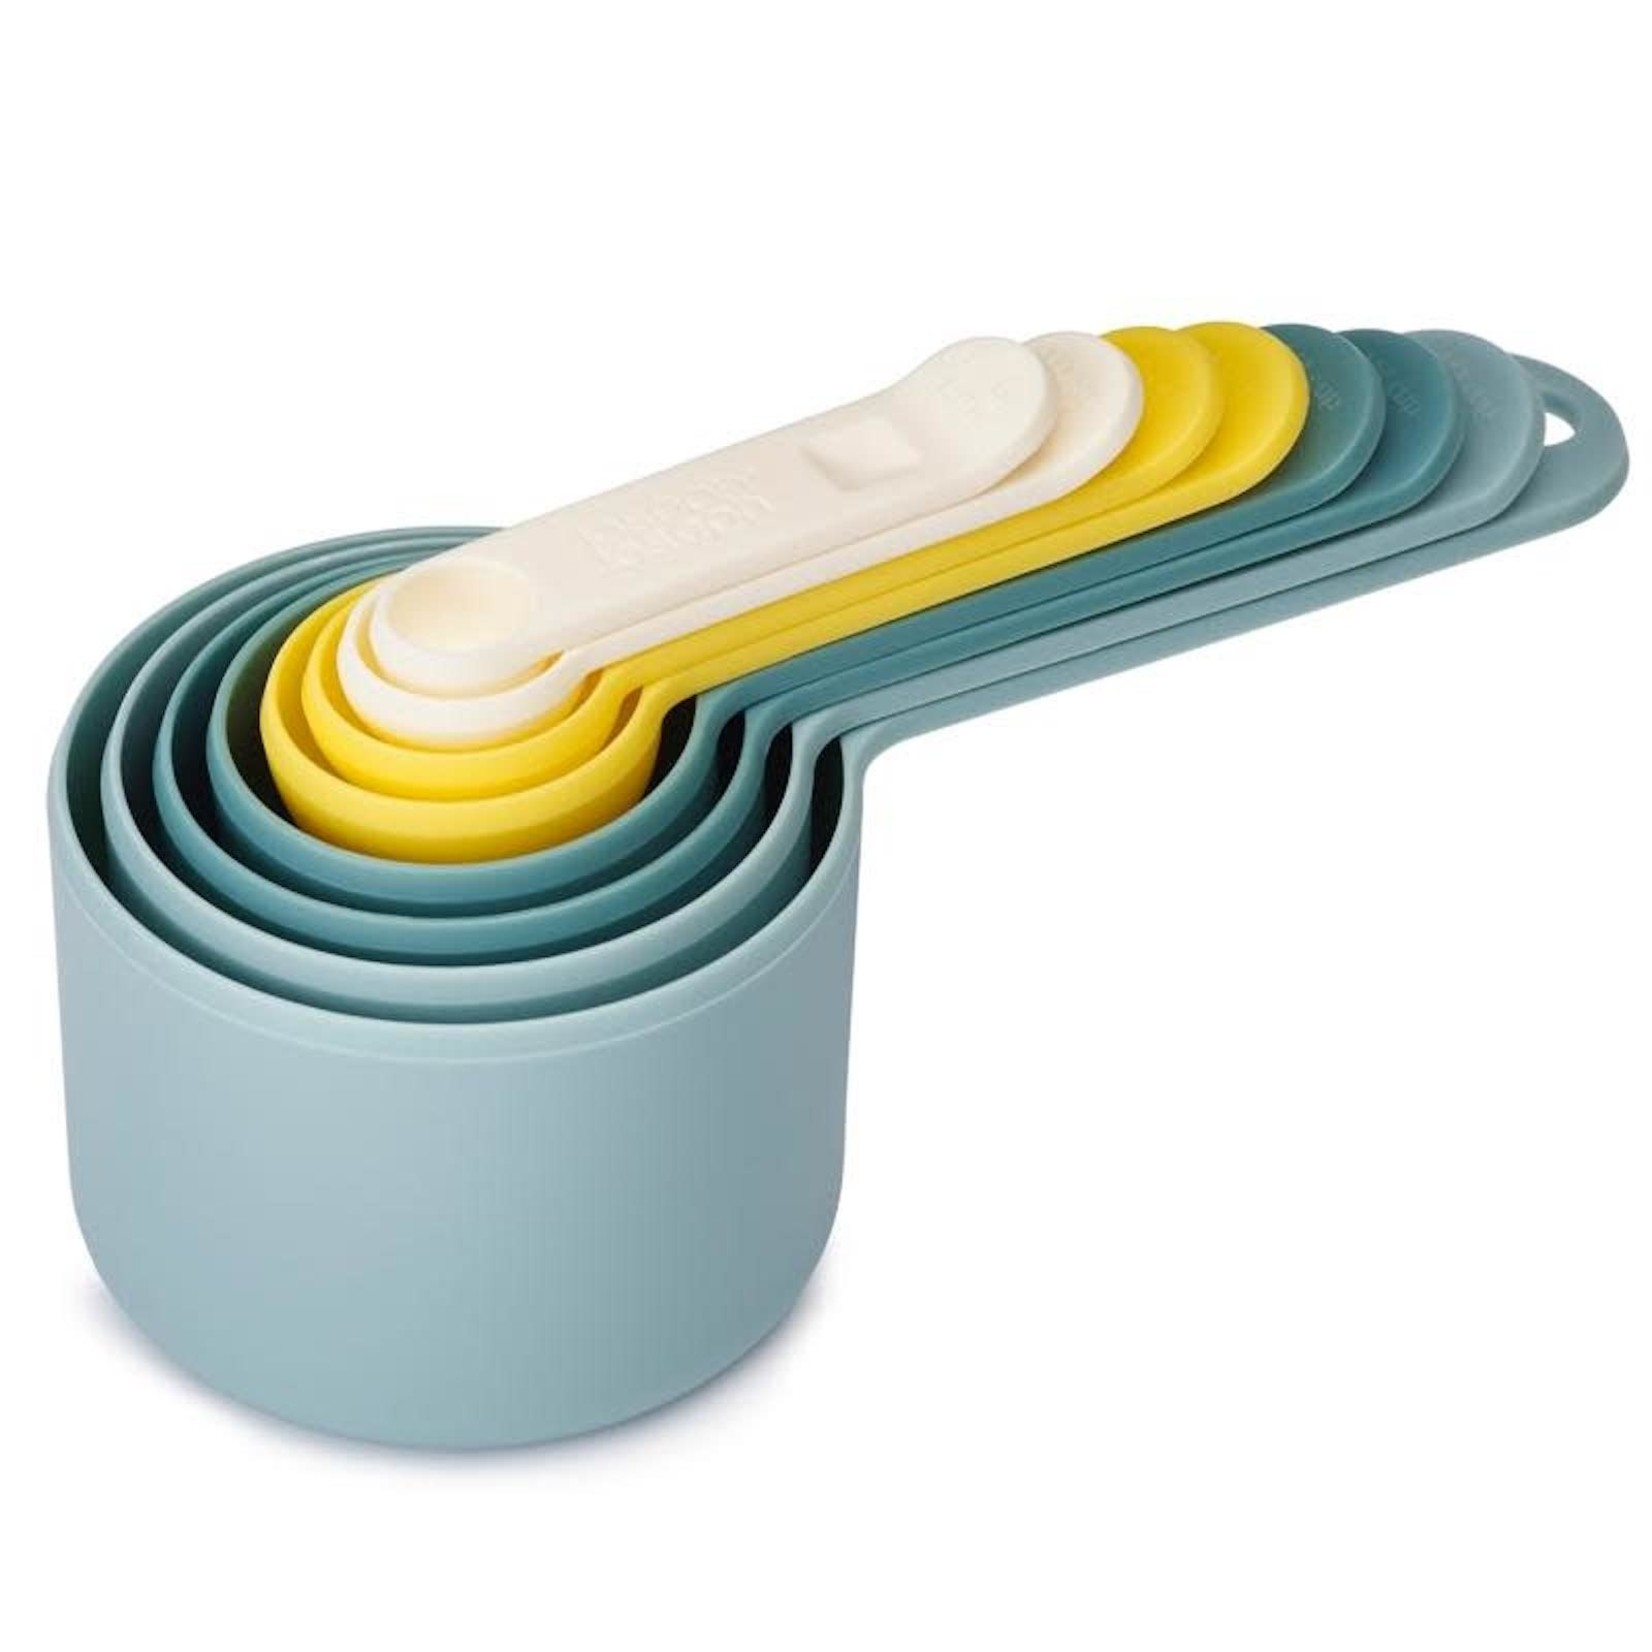 Joseph Joseph Nest OPAL Measuring Cup and Spoon Set